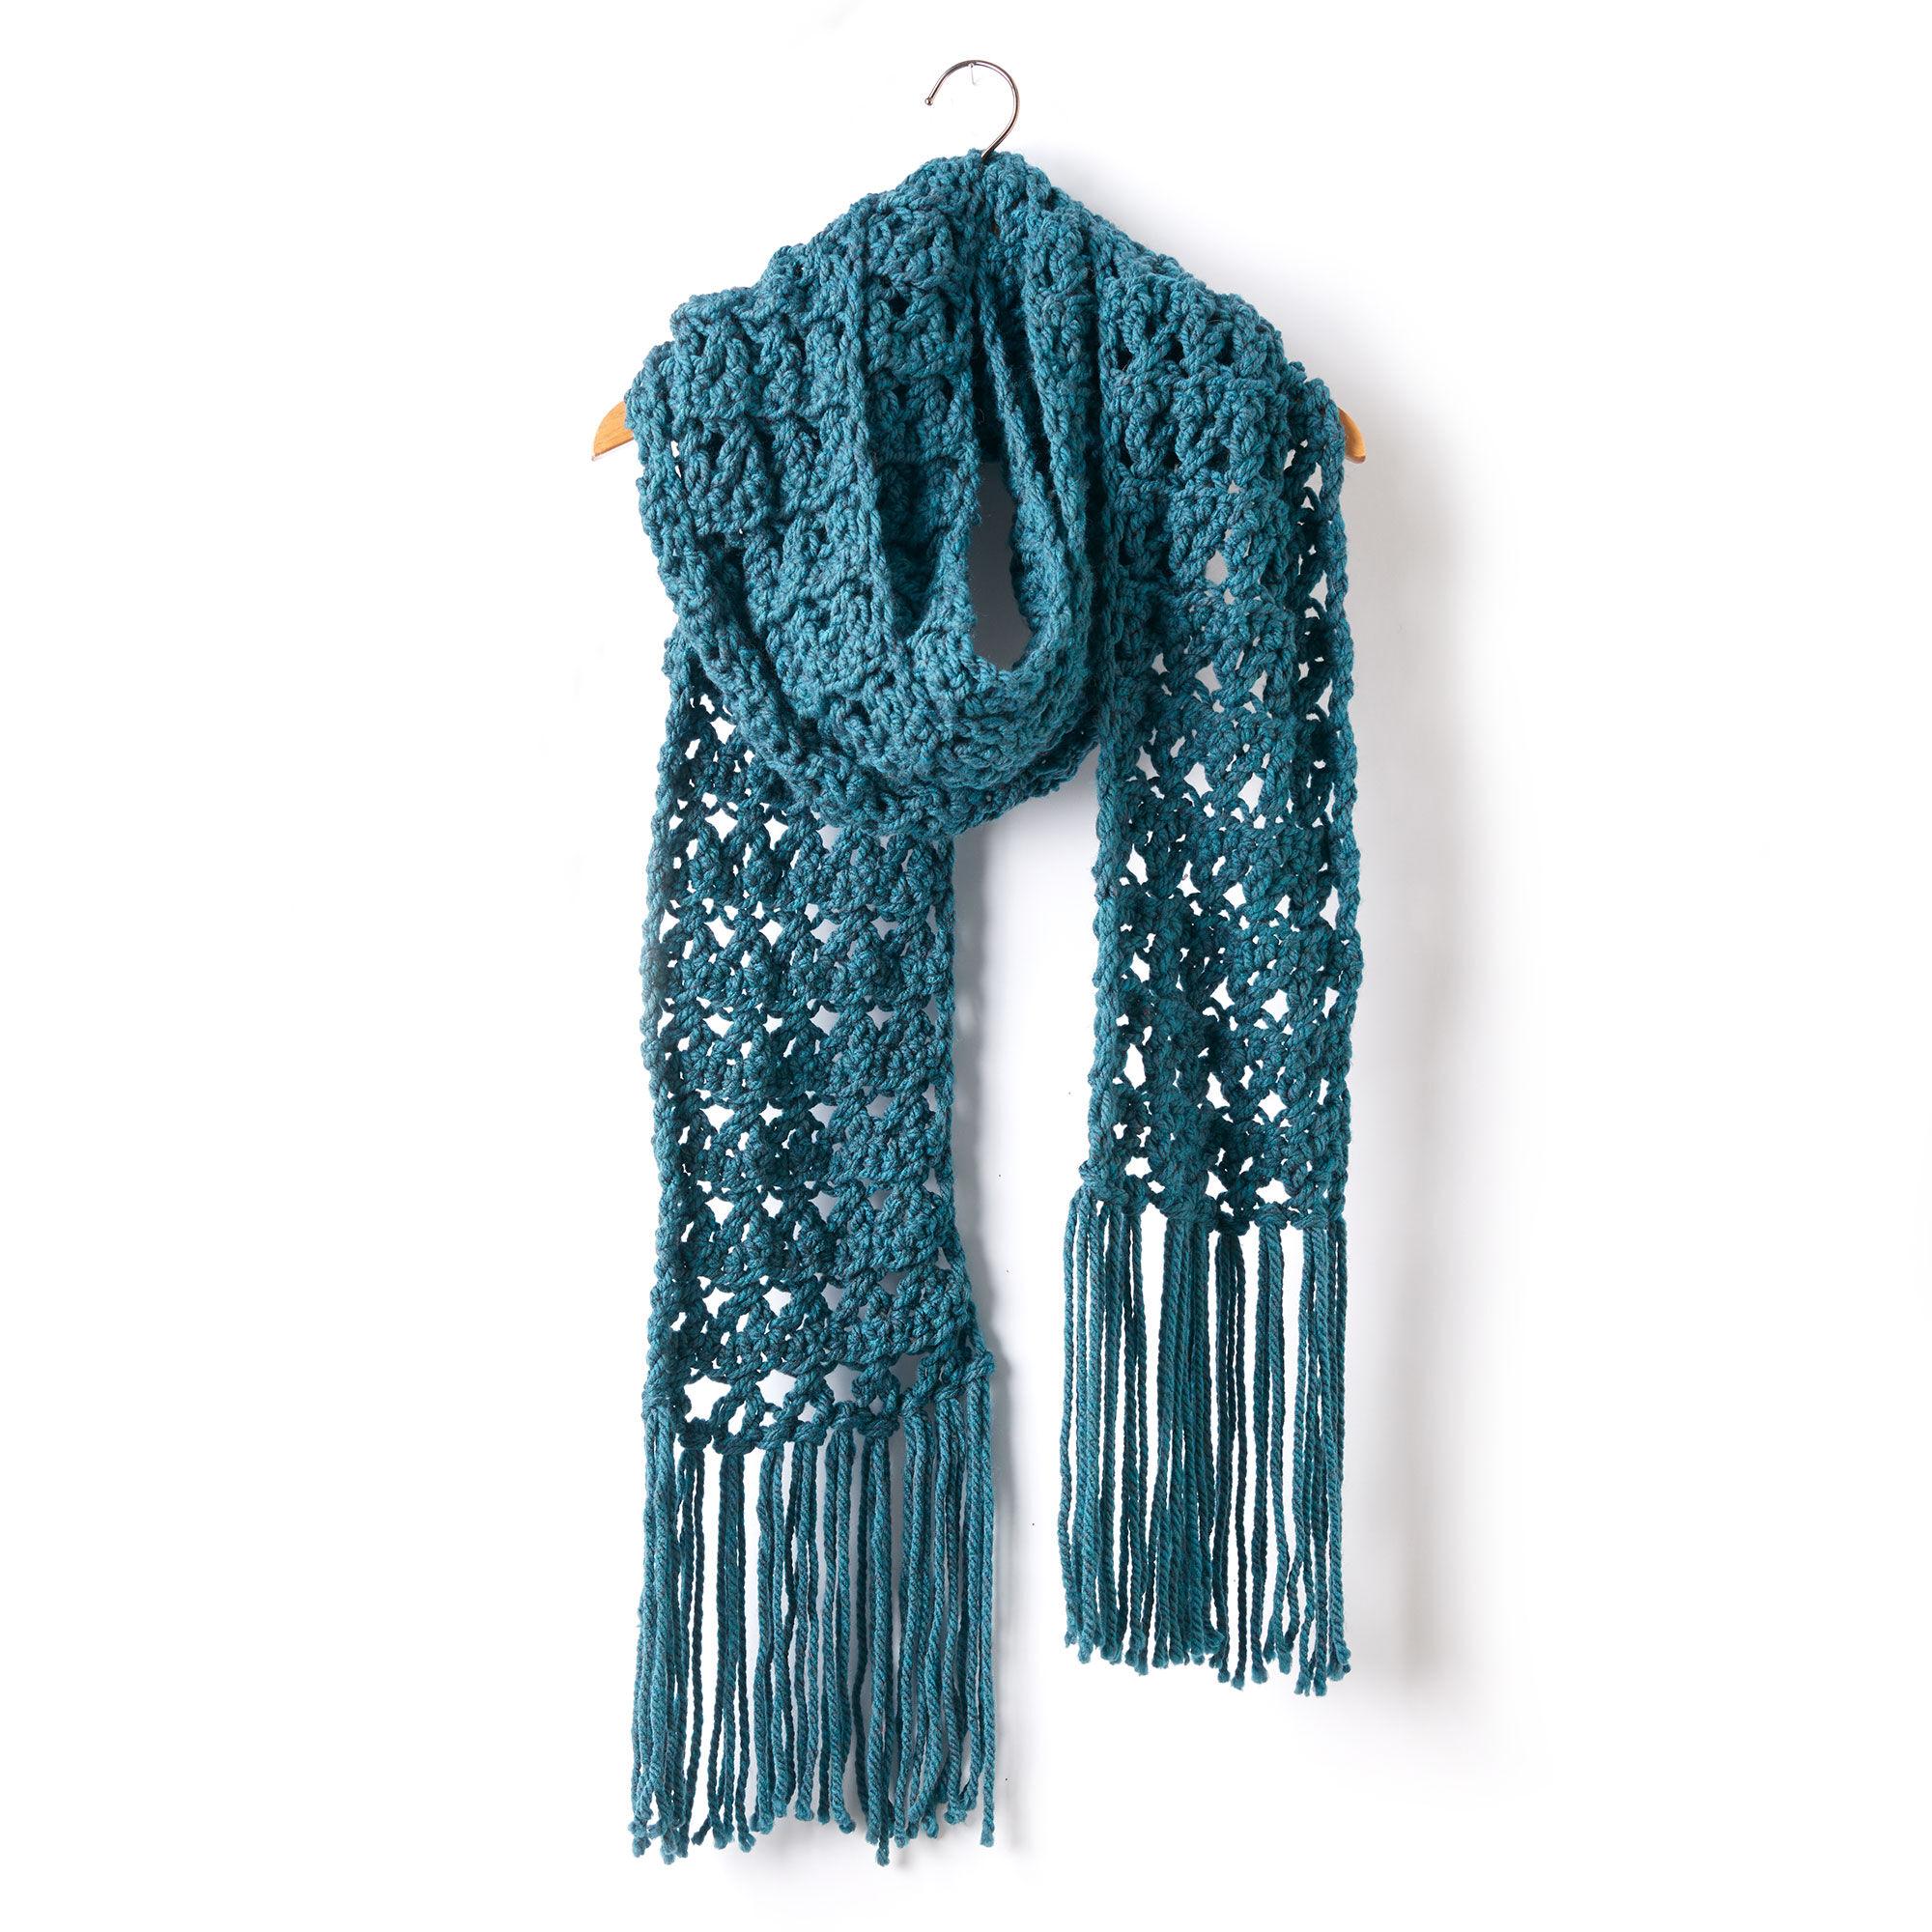 Bernat Crossing Paths Crochet Super Scarf | Yarnspirations